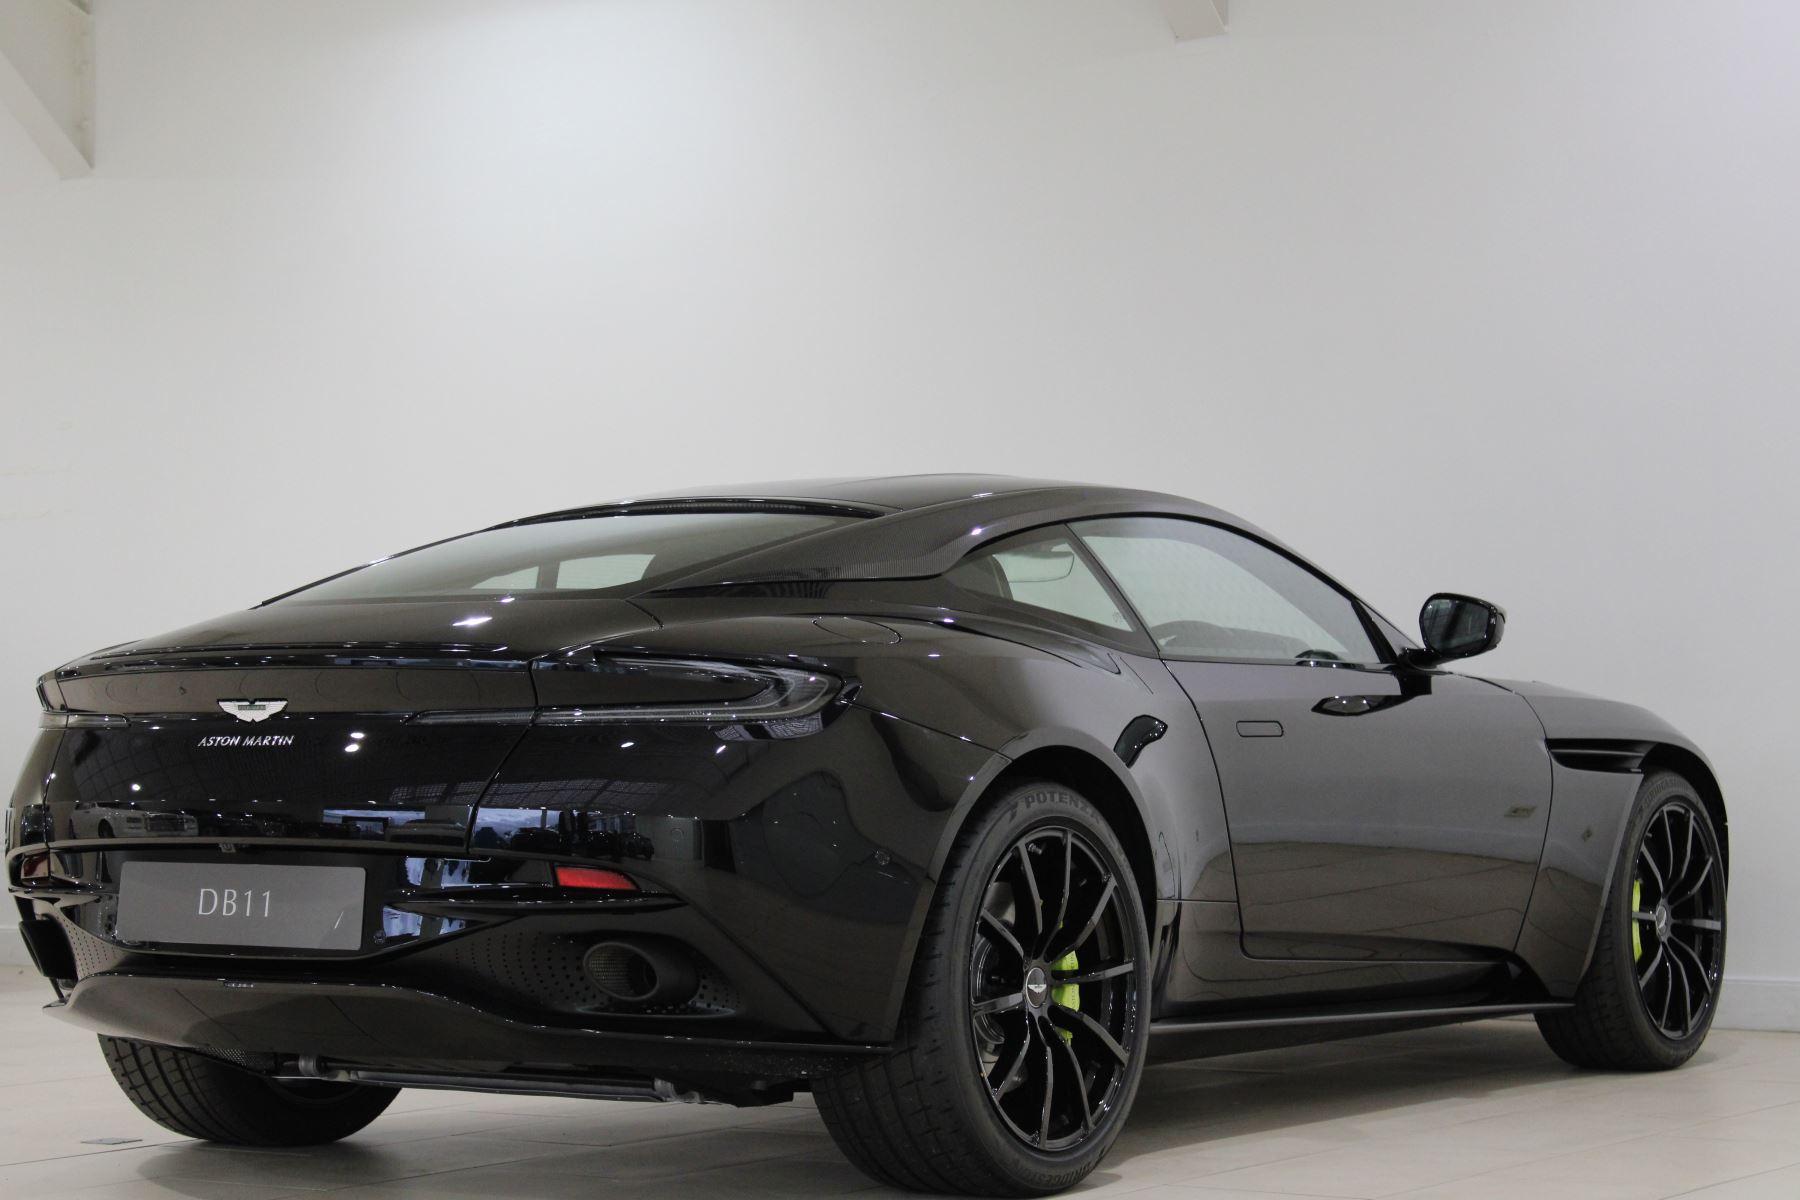 Aston Martin DB11 AMR Touchtronic image 27